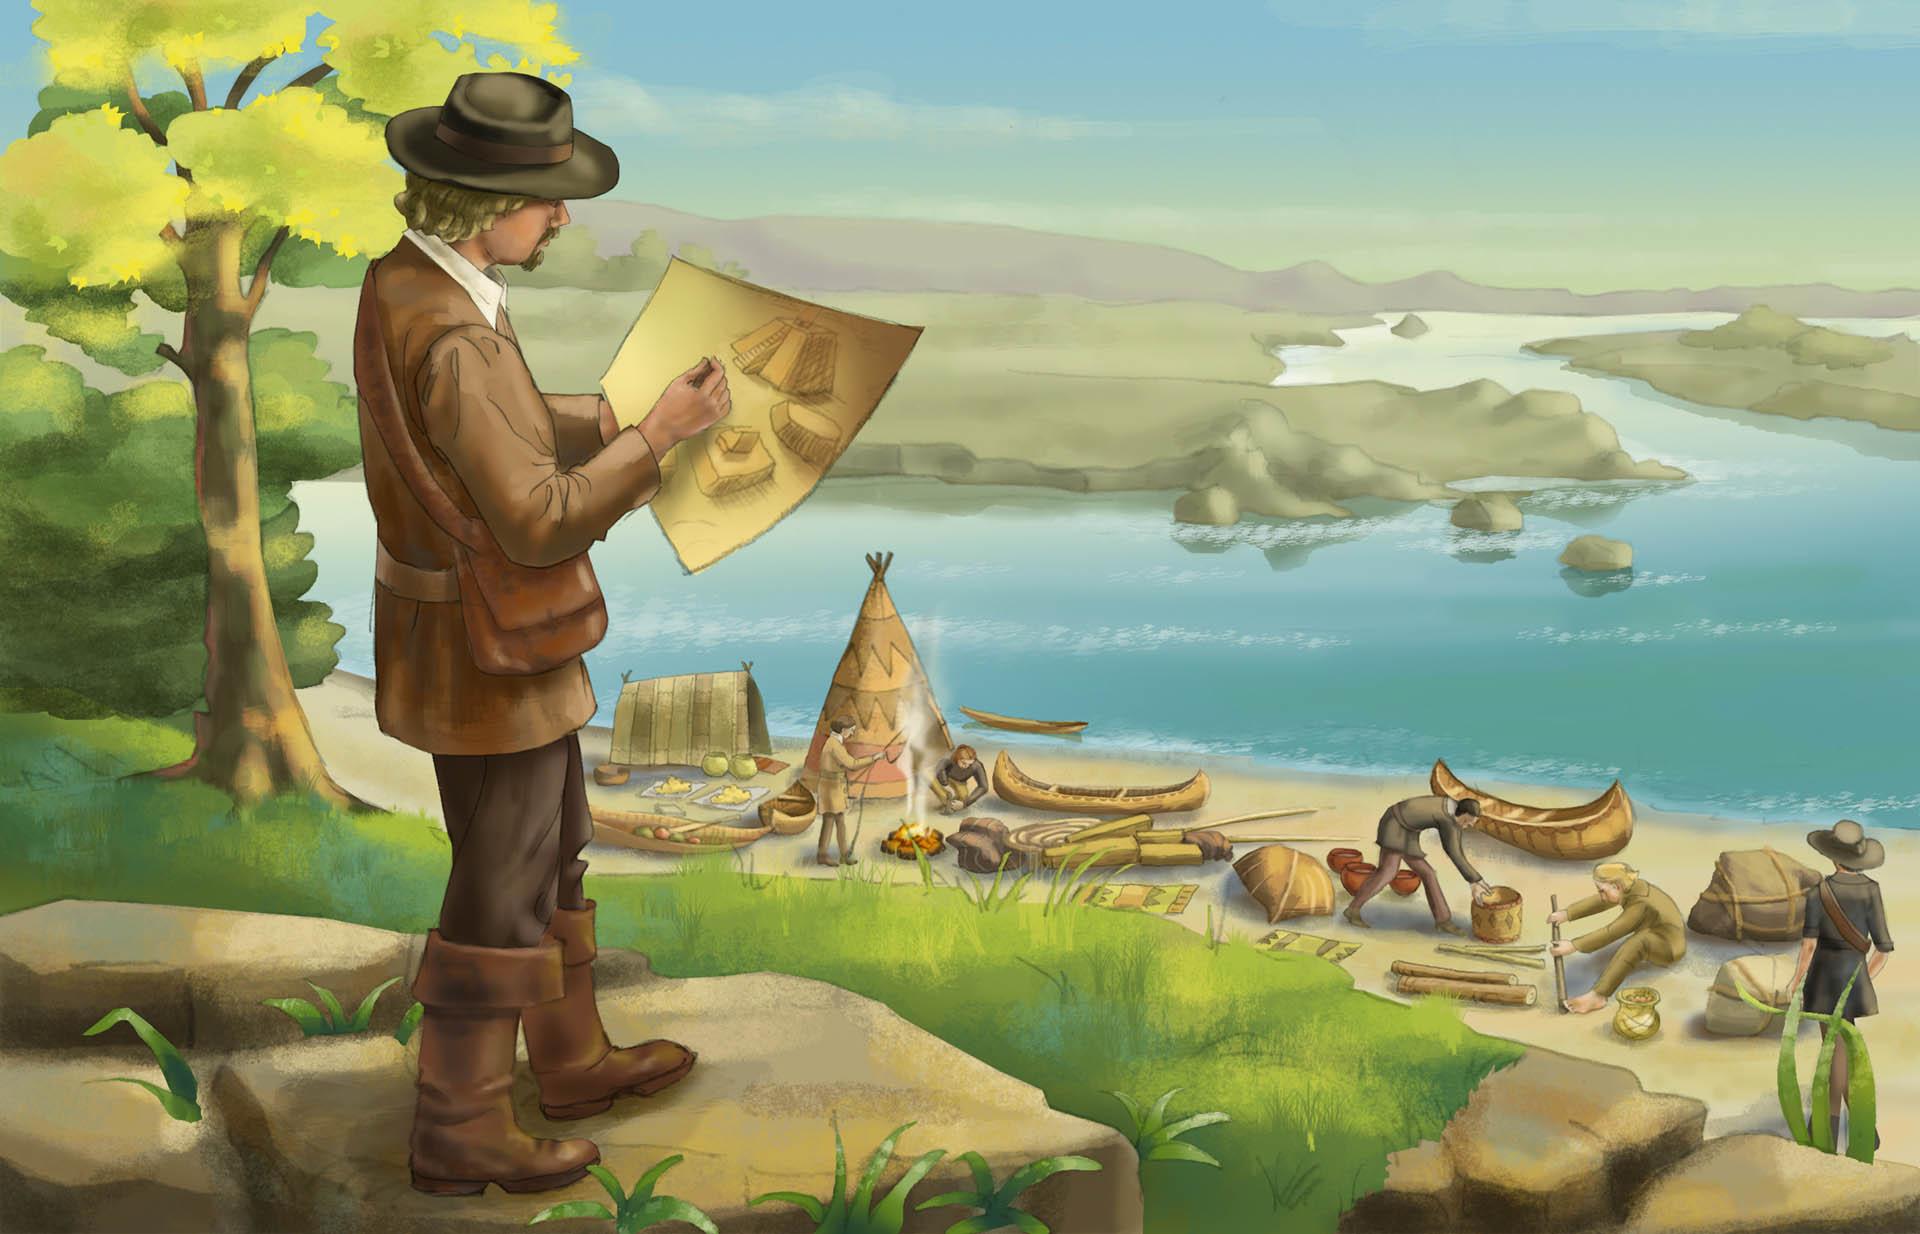 Natchez Indian Camp Illustration • Pearson USA